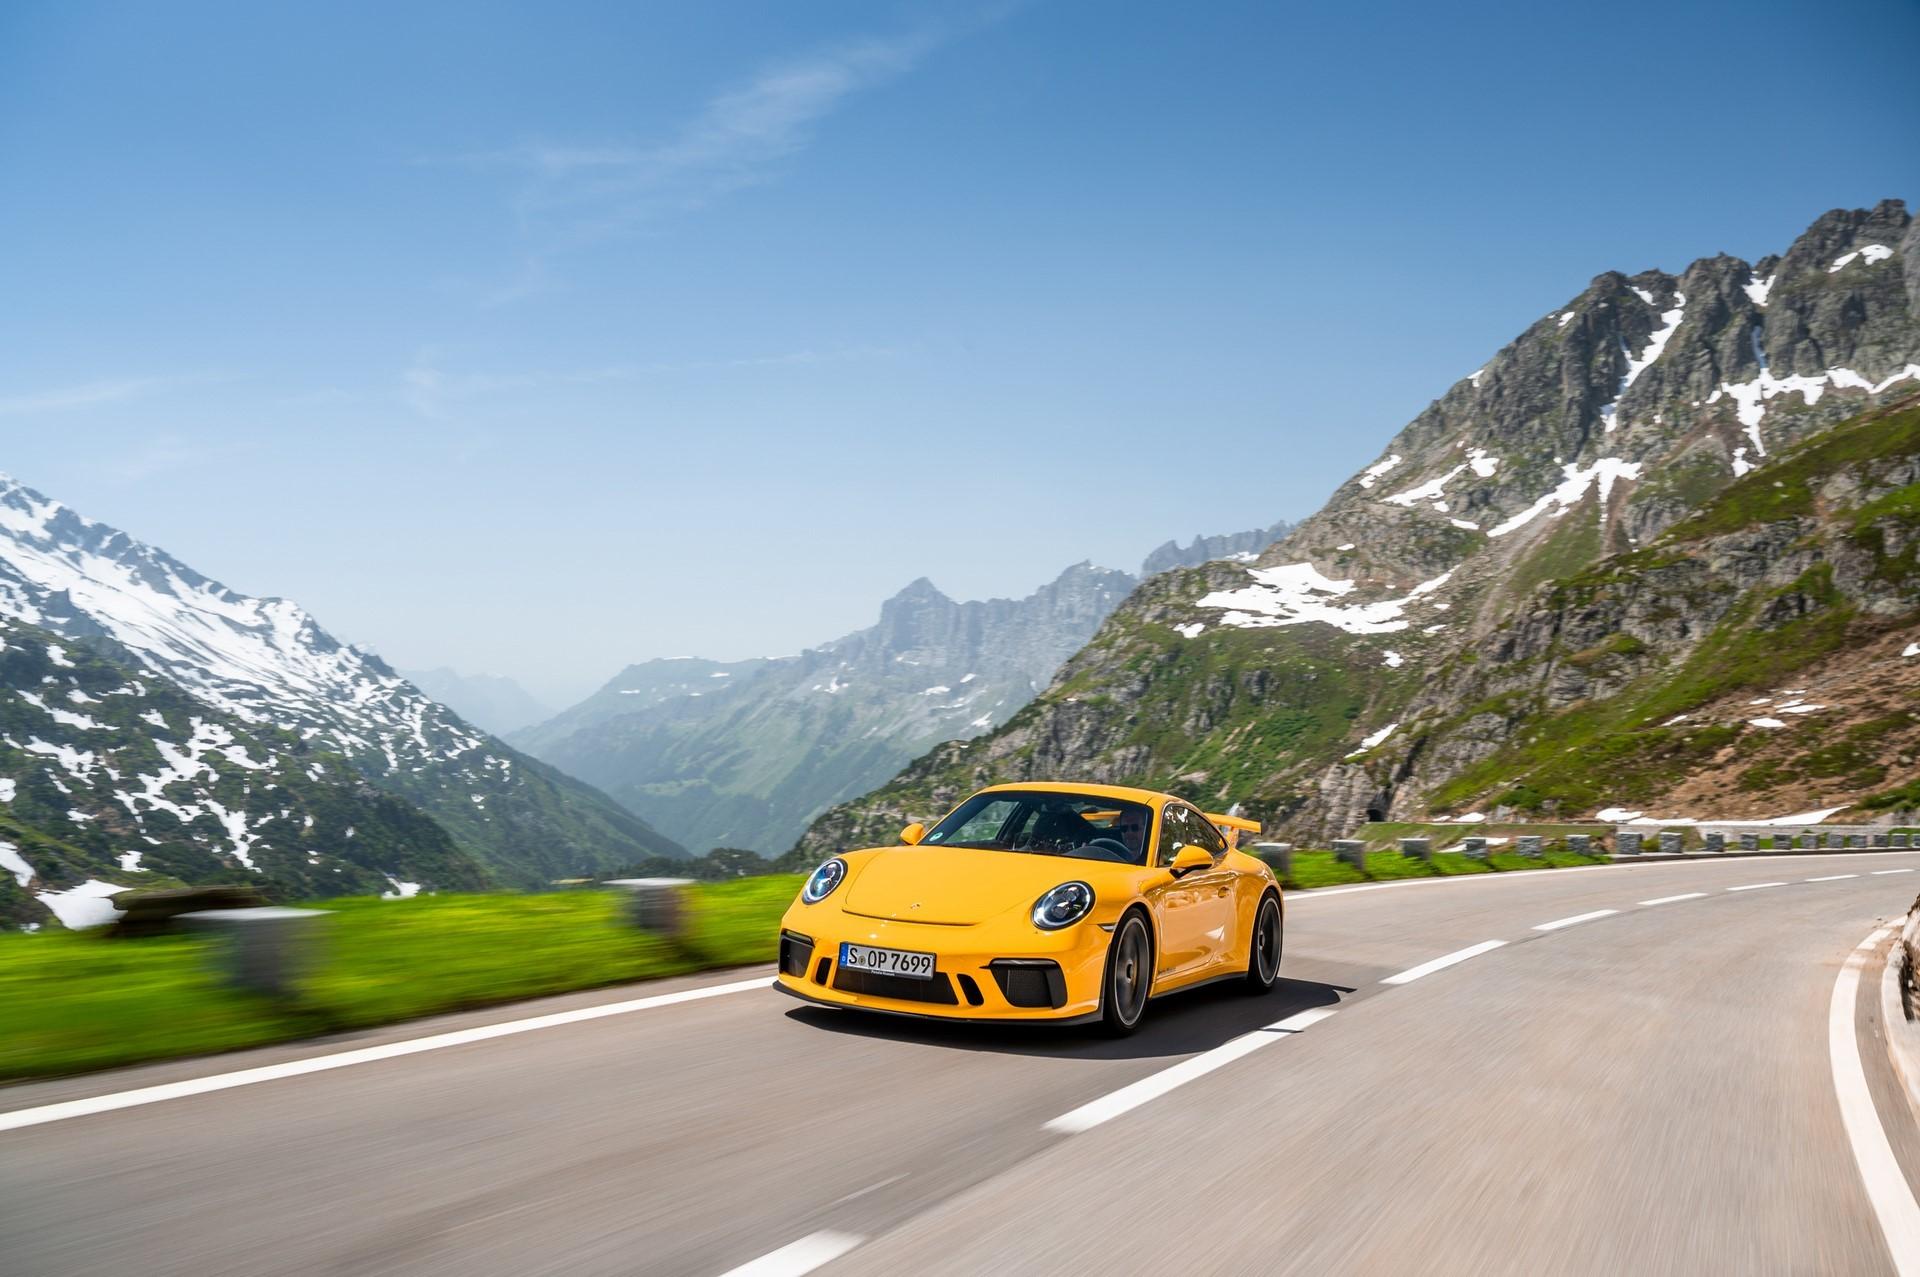 20-years-of-the-Porsche-911-GT3-33